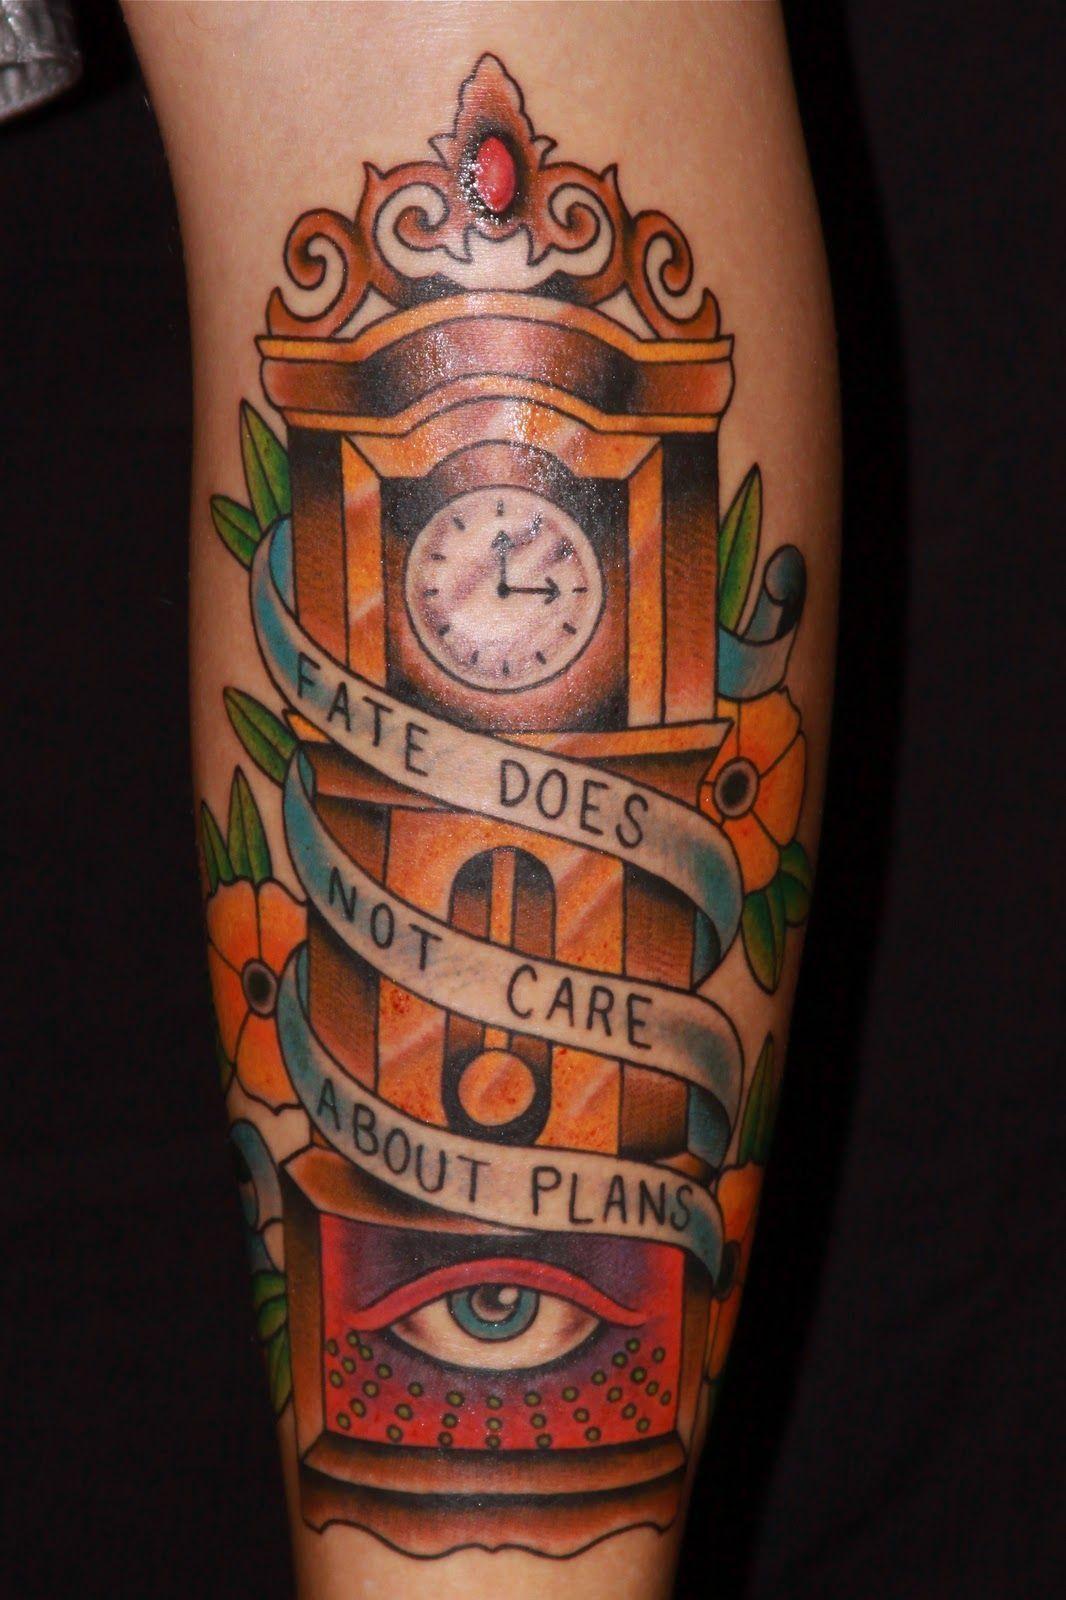 Tropical Decor Antique Clock Tattoo Design Antique Clock Tattoo Design Table Watch Antique Cl In 2020 Grandfather Clock Tattoo Grandfather Tattoo Clock Tattoo